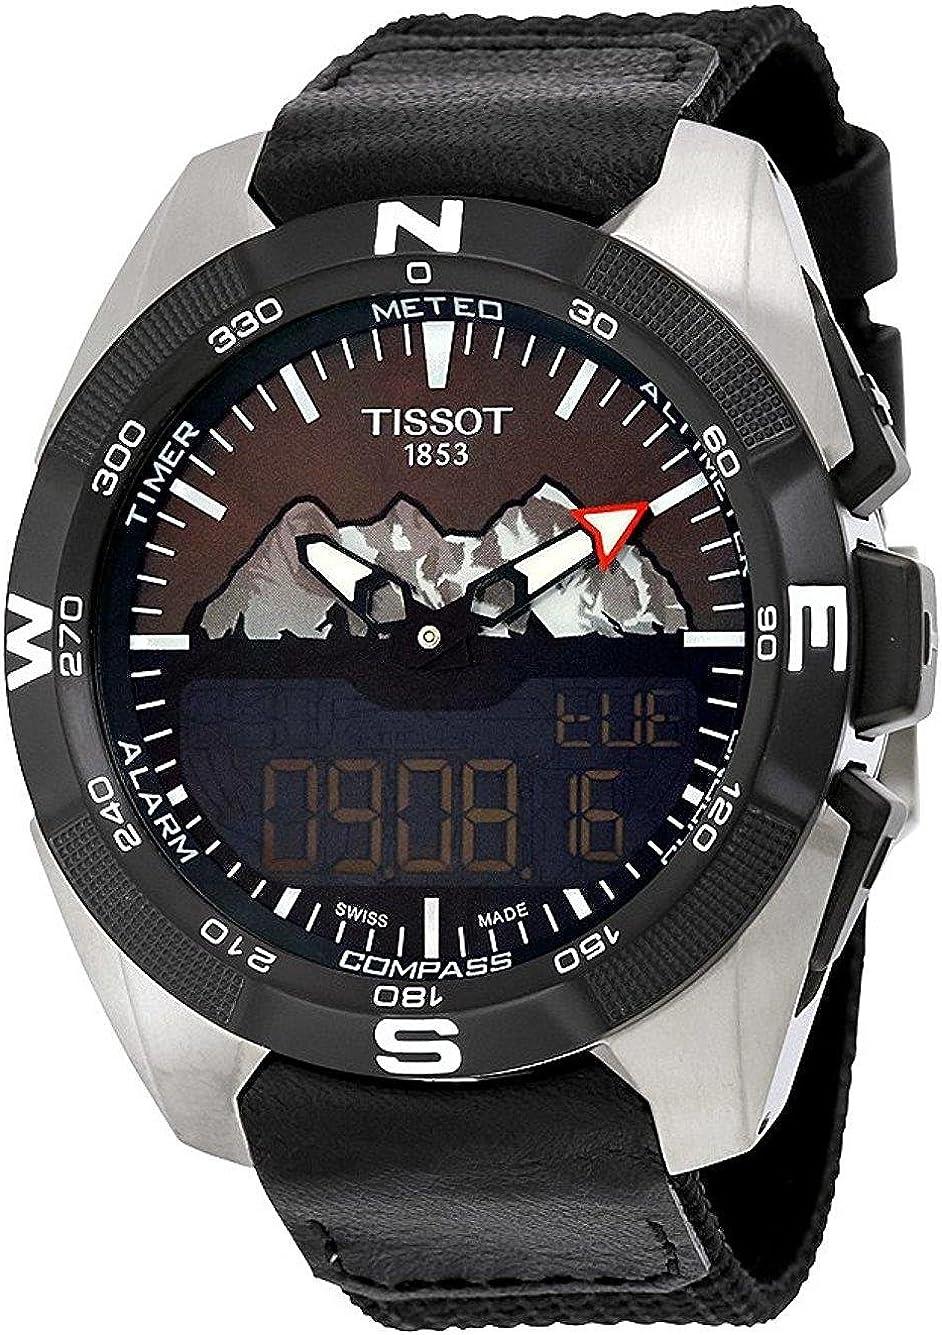 Tissot T-Touch Expert T091.420.46.051.10 - Reloj solar Jungfraub